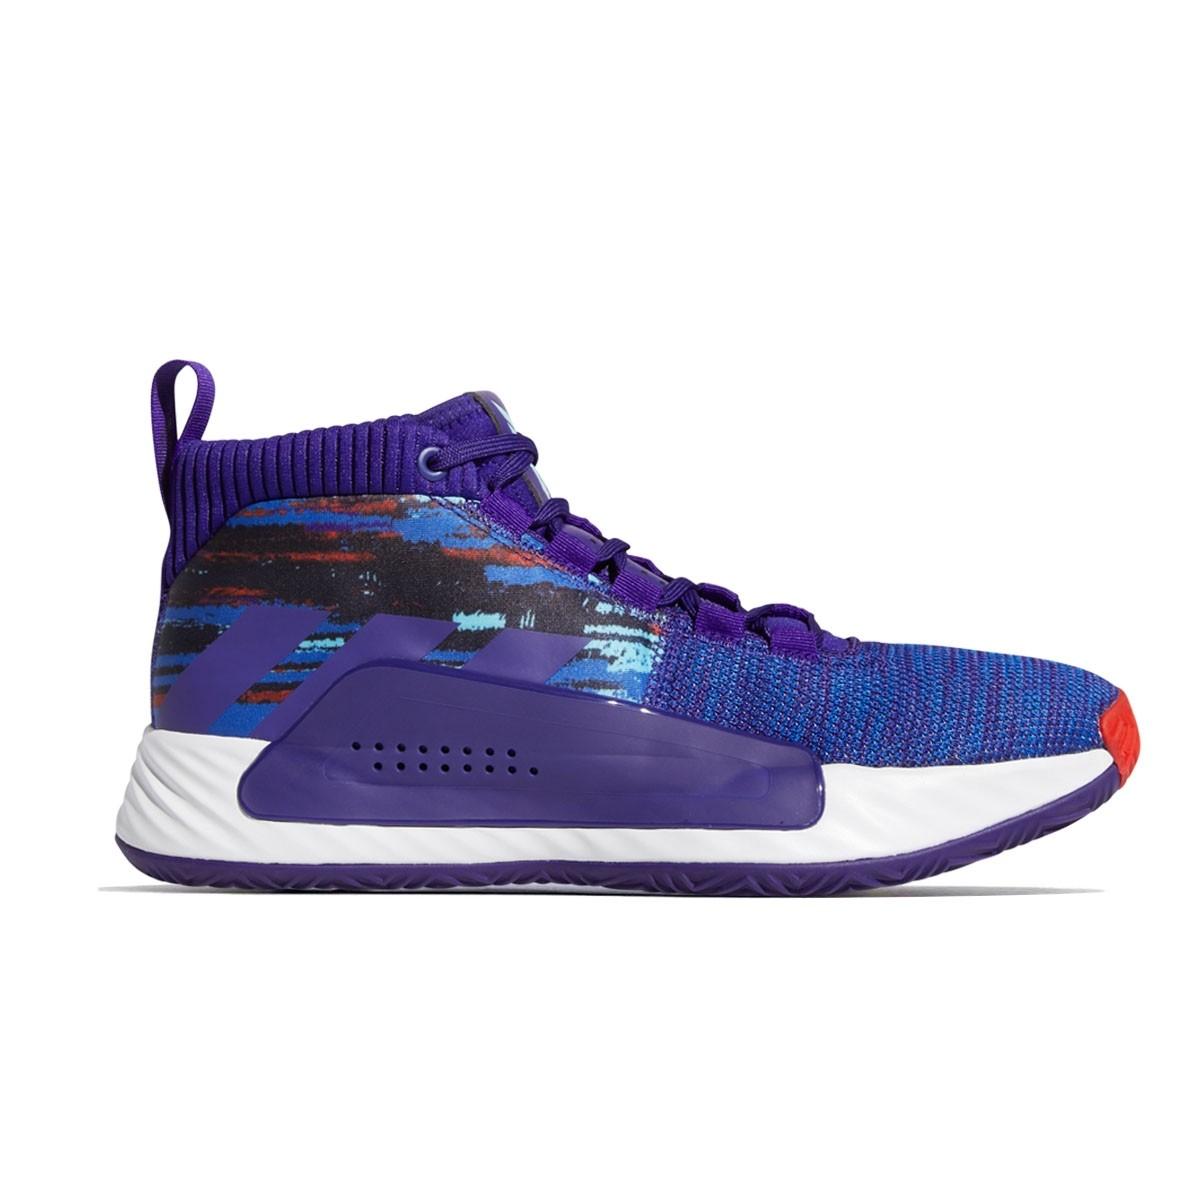 ADIDAS Dame 5 Jr 'Purple Royal'